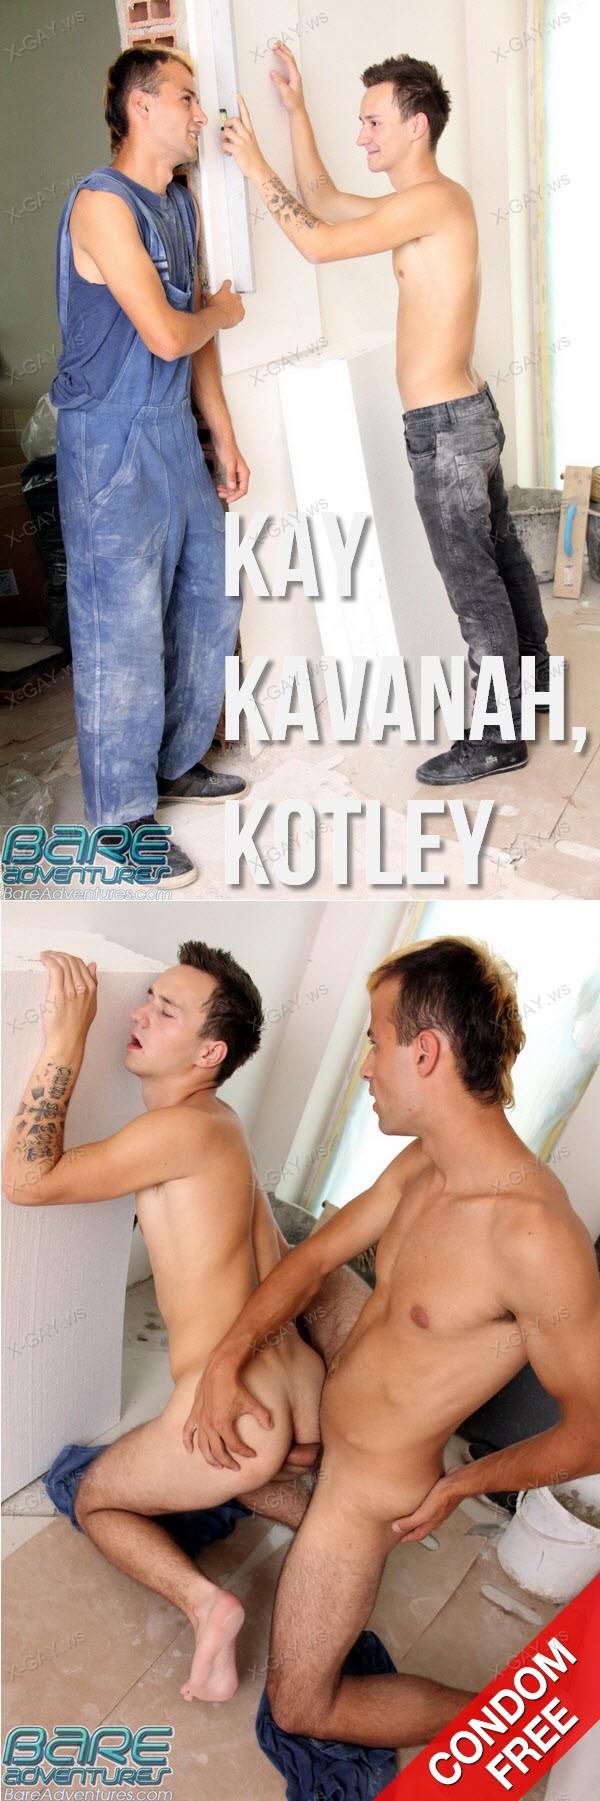 bareadventures_kaykavanah_kotley.jpg